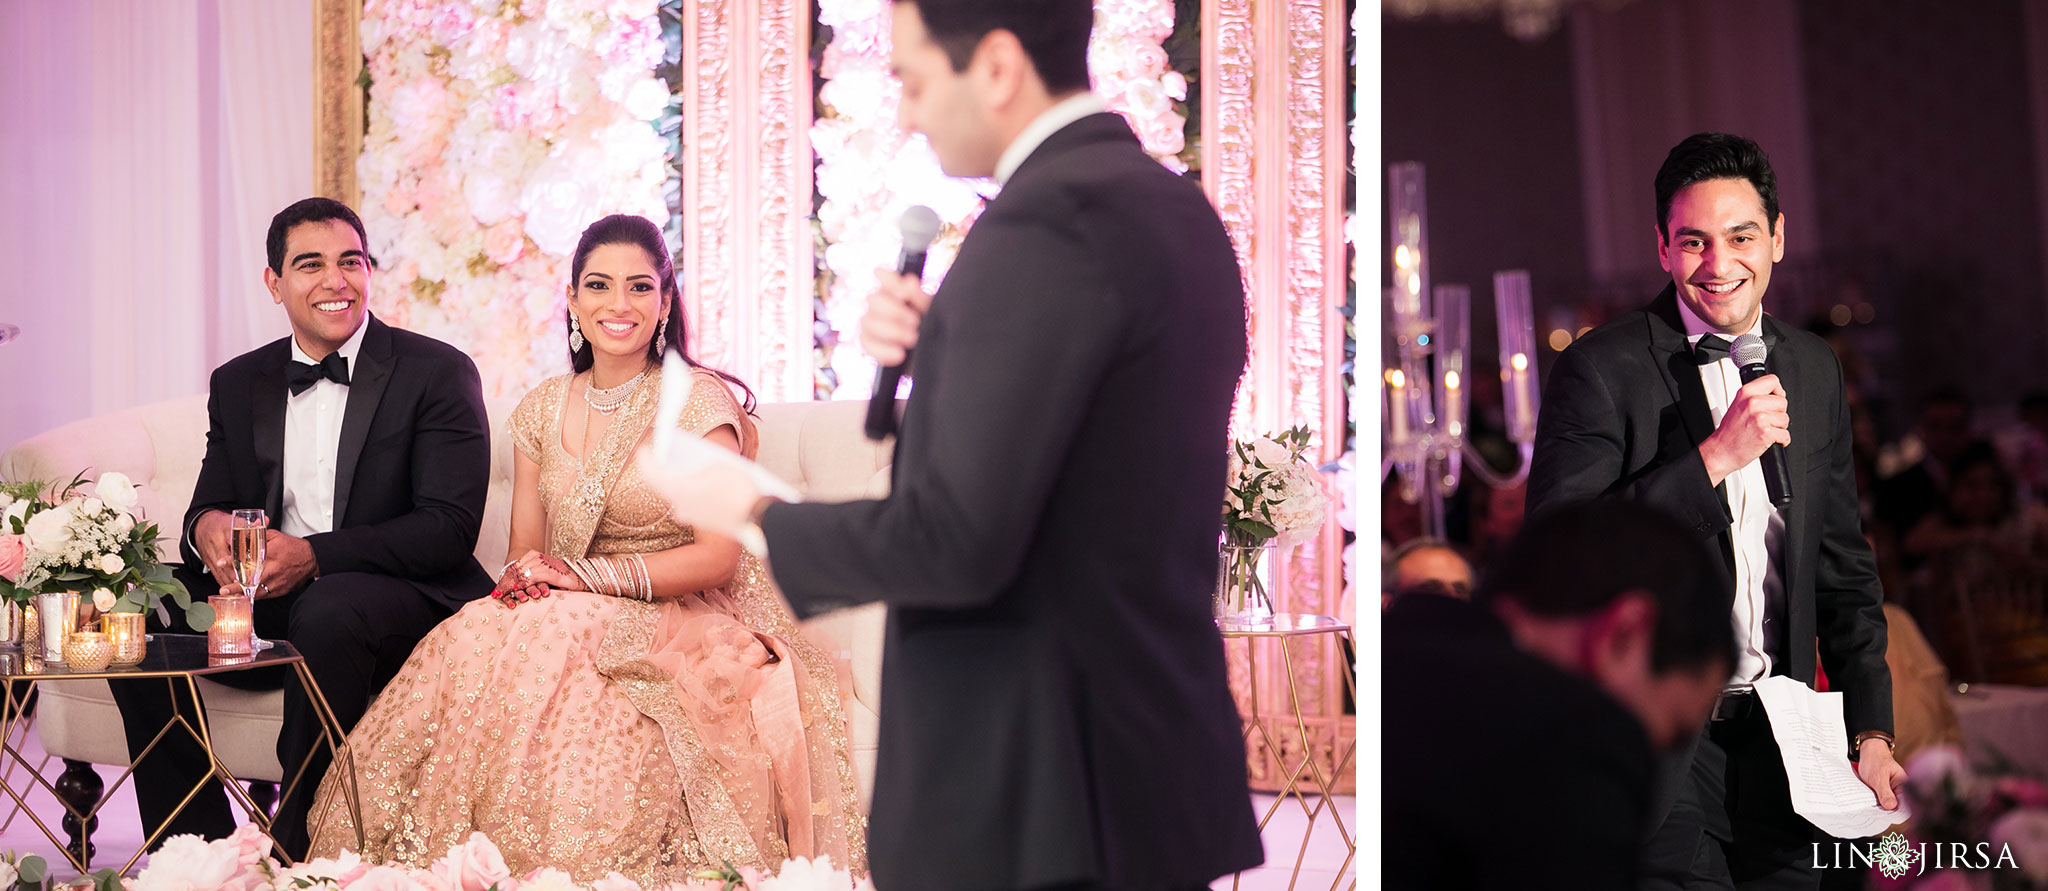 44 ritz carlton laguna niguel indian reception photography